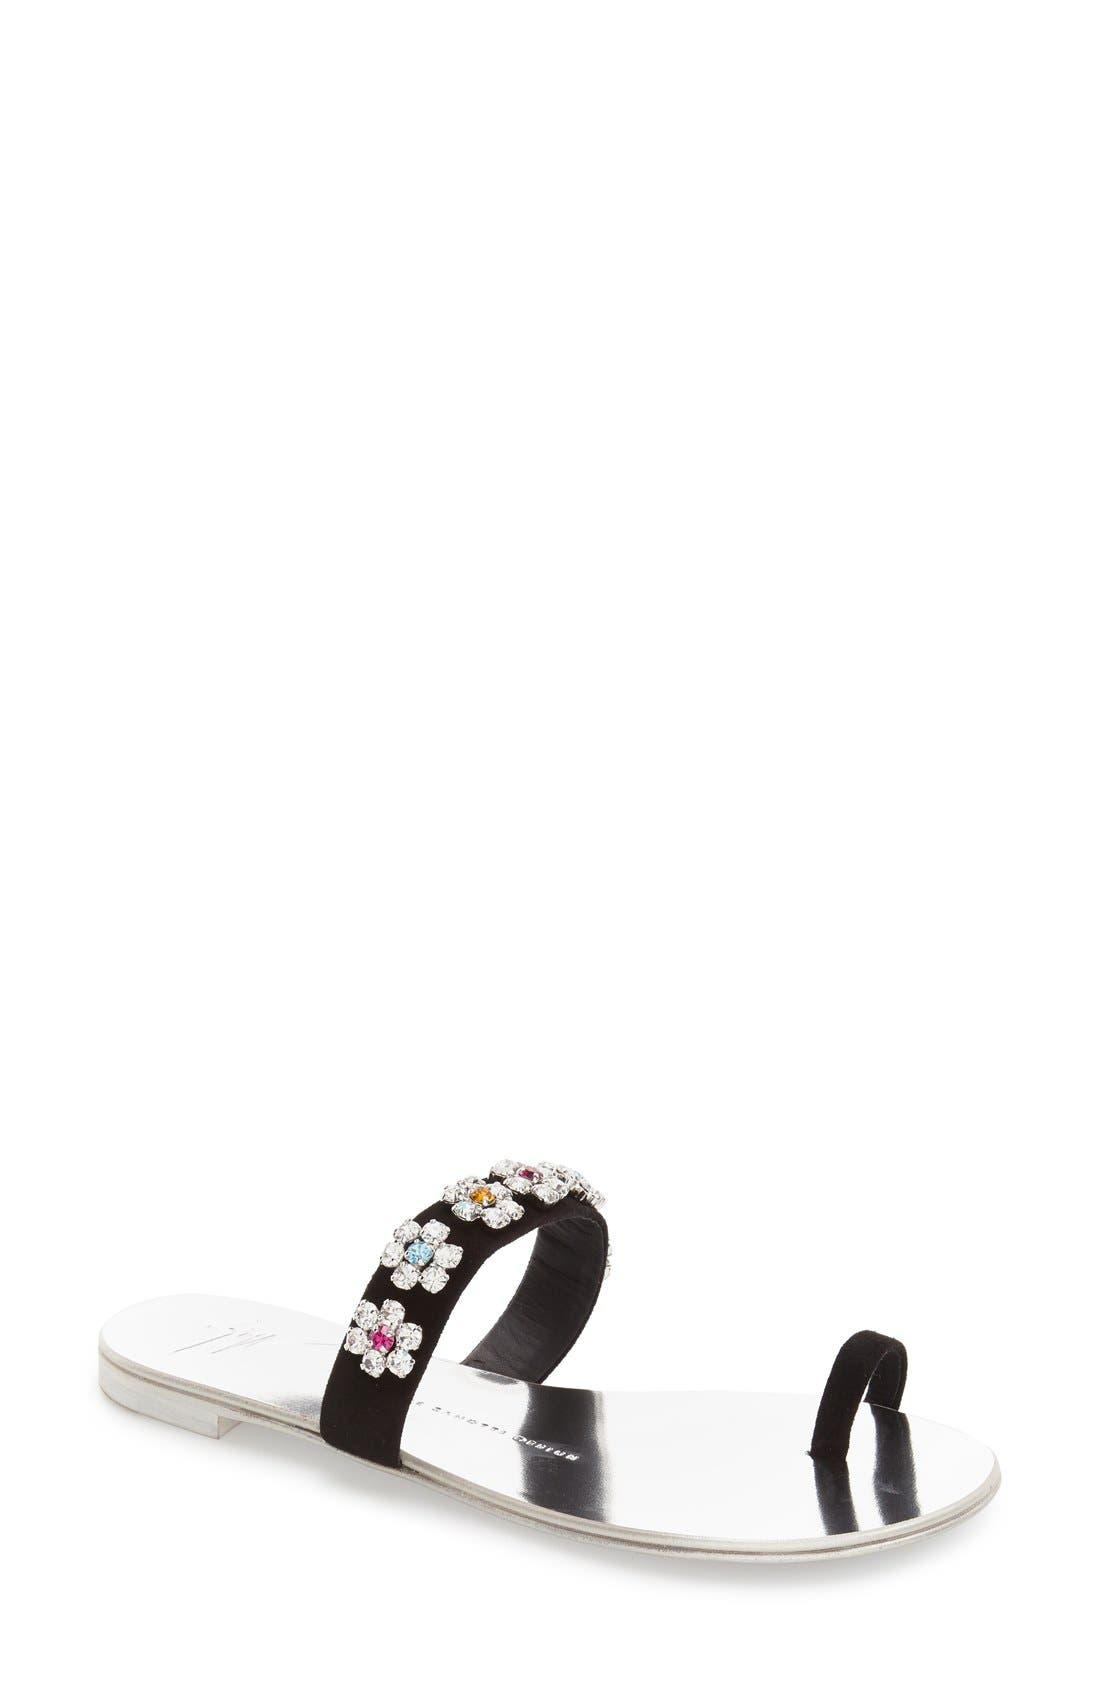 Main Image - Giuseppe Zanotti Crystal Embellished Flat Sandal (Women)